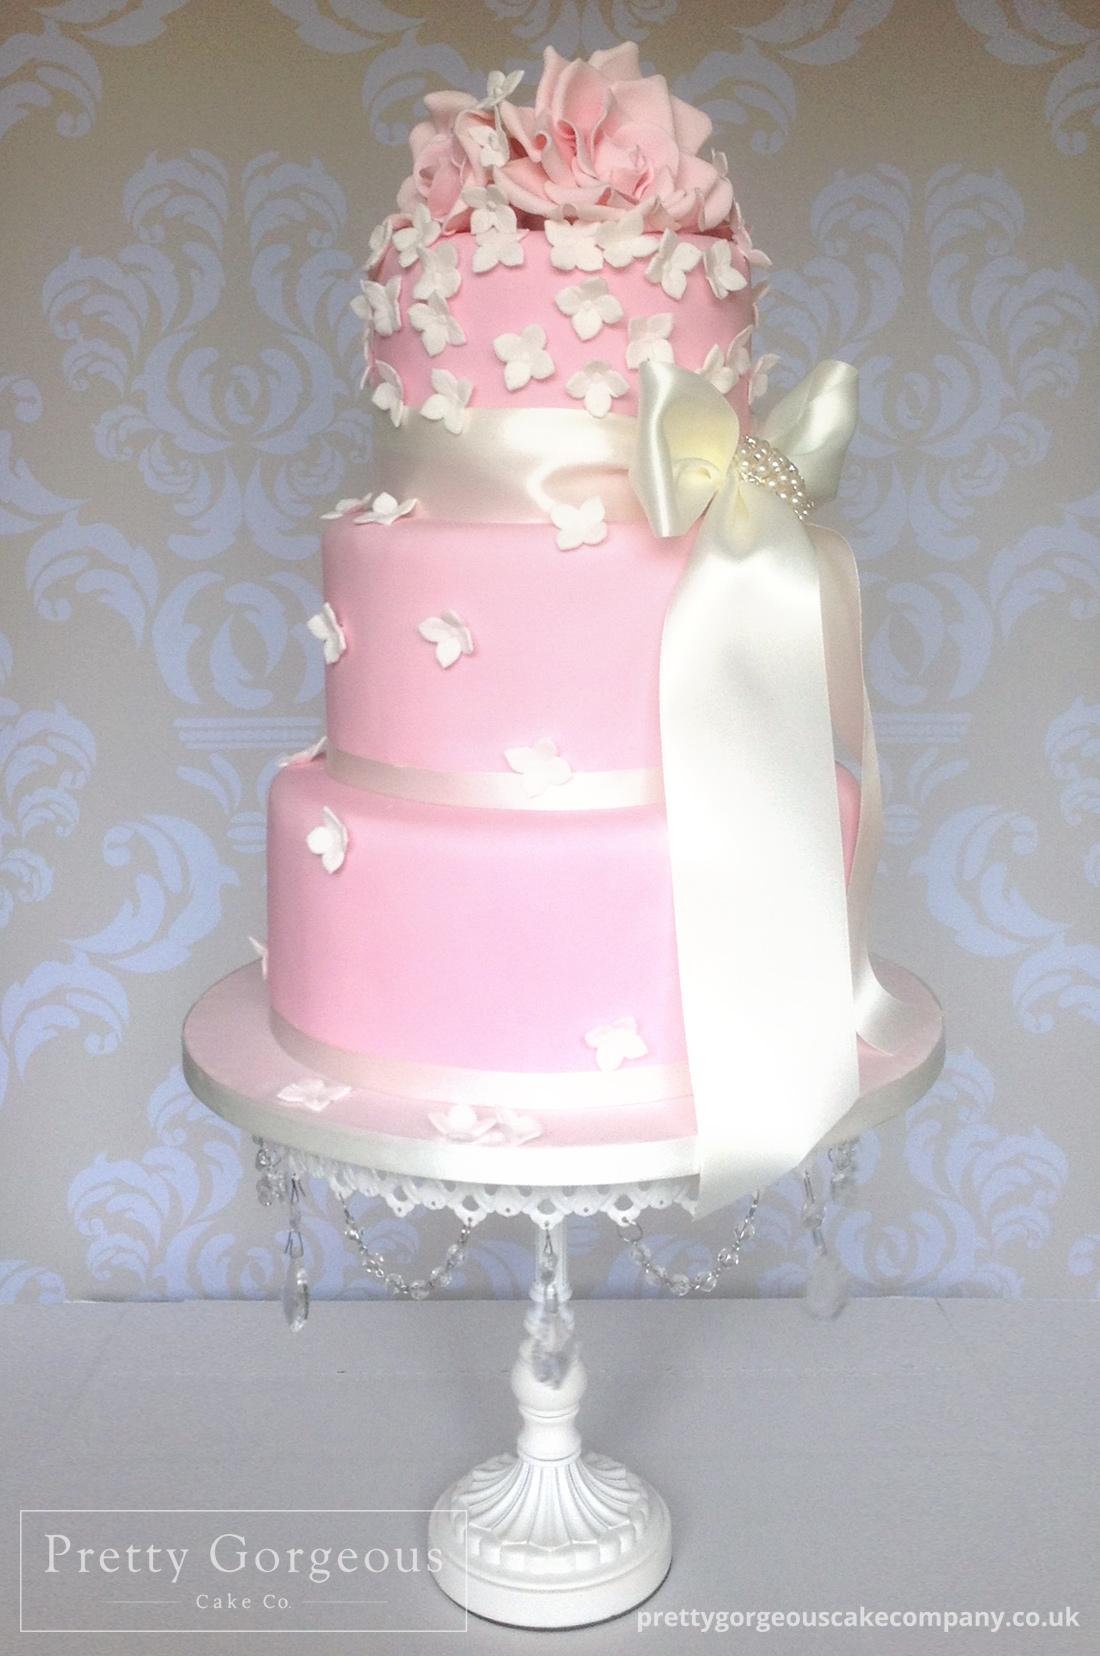 Soft pink, white roses, hydrangeas, ribbons, three tier, wedding cake